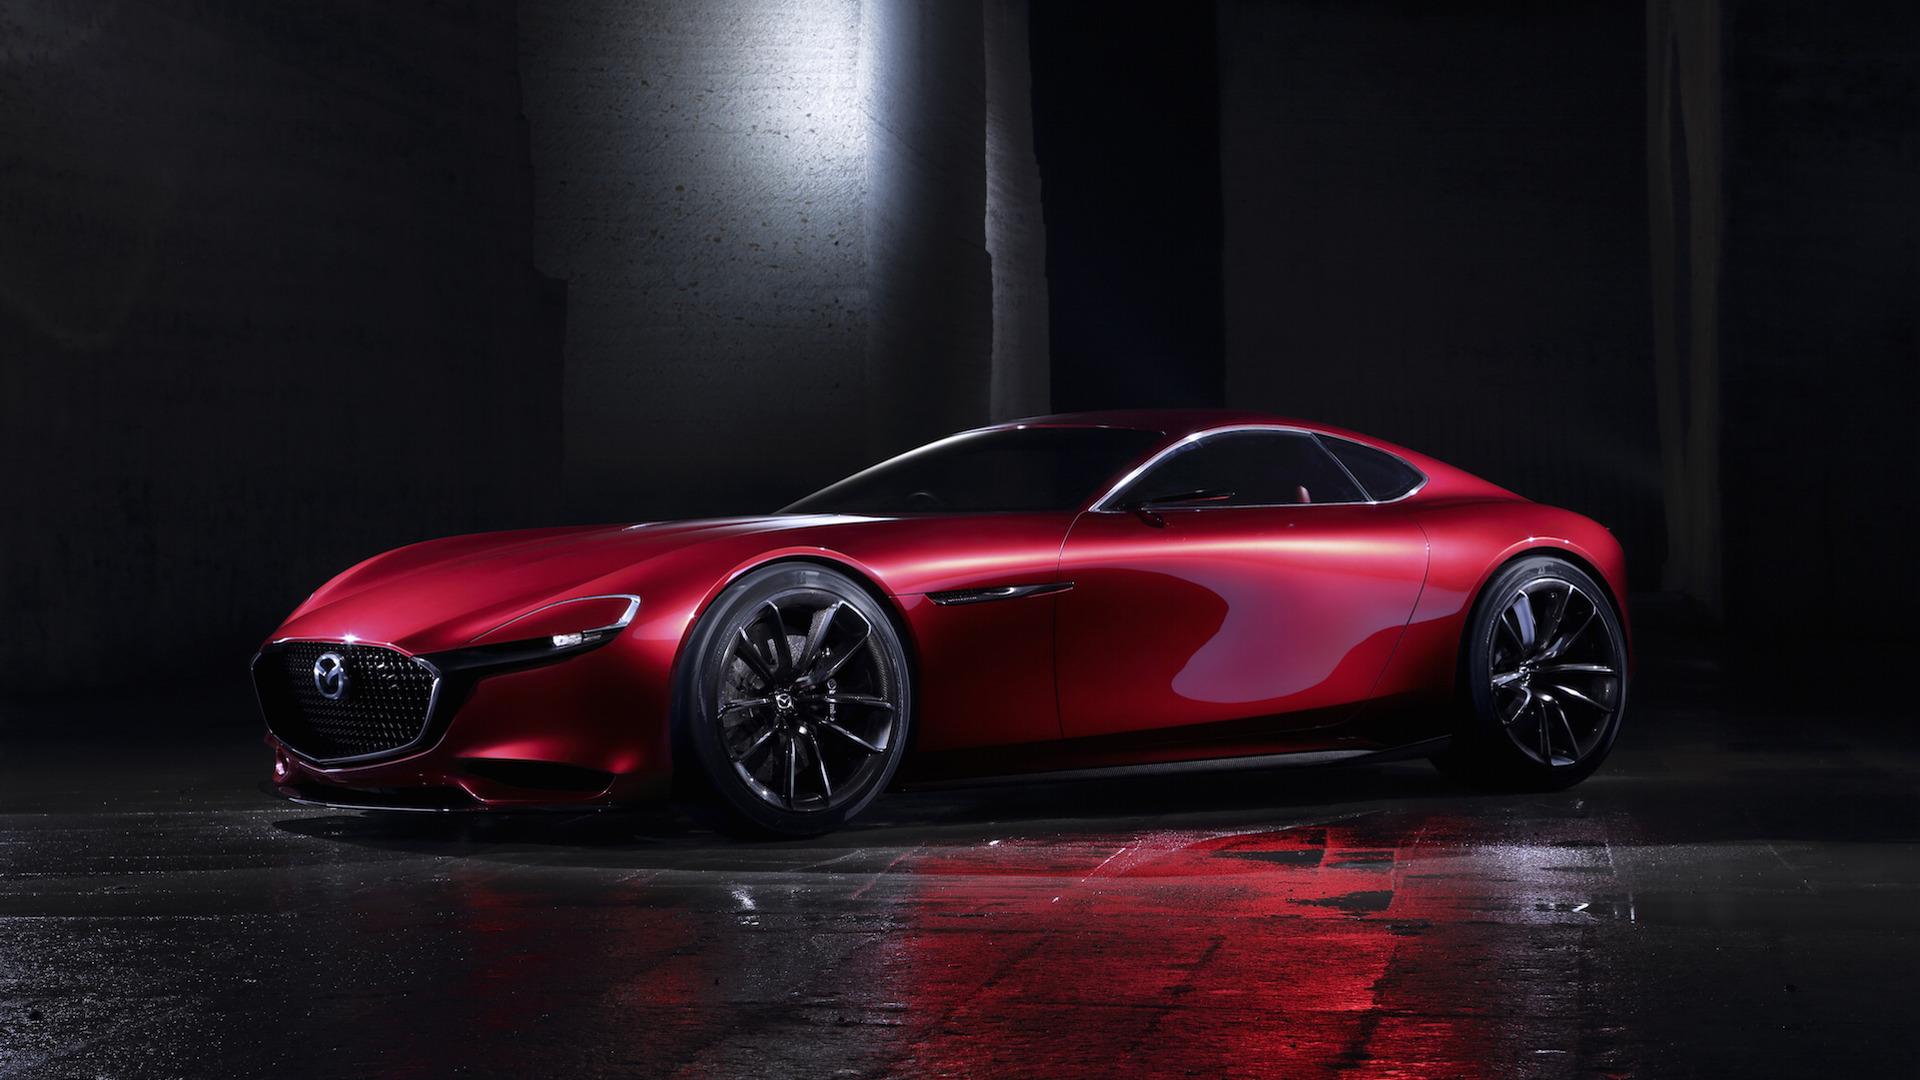 Mazda неожиданно запатентовала новый суперкар 2